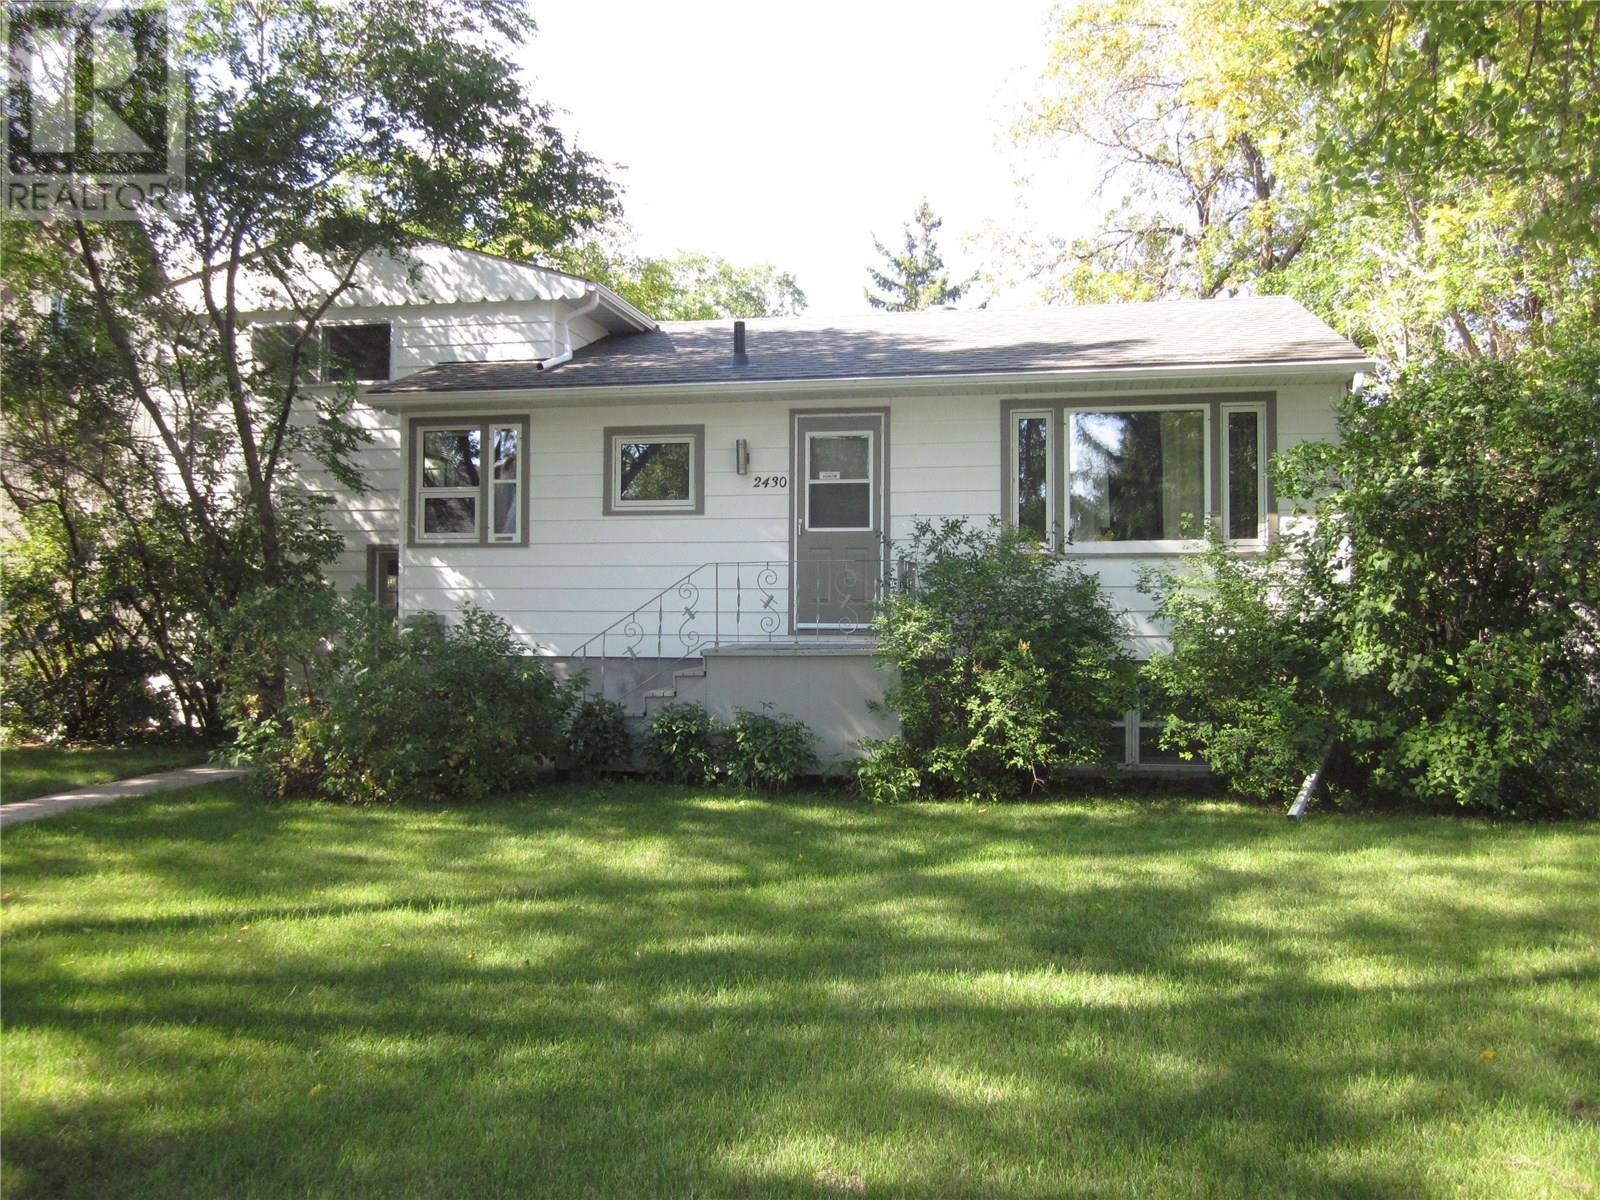 House for sale at 2430 Mackay St Regina Saskatchewan - MLS: SK770890